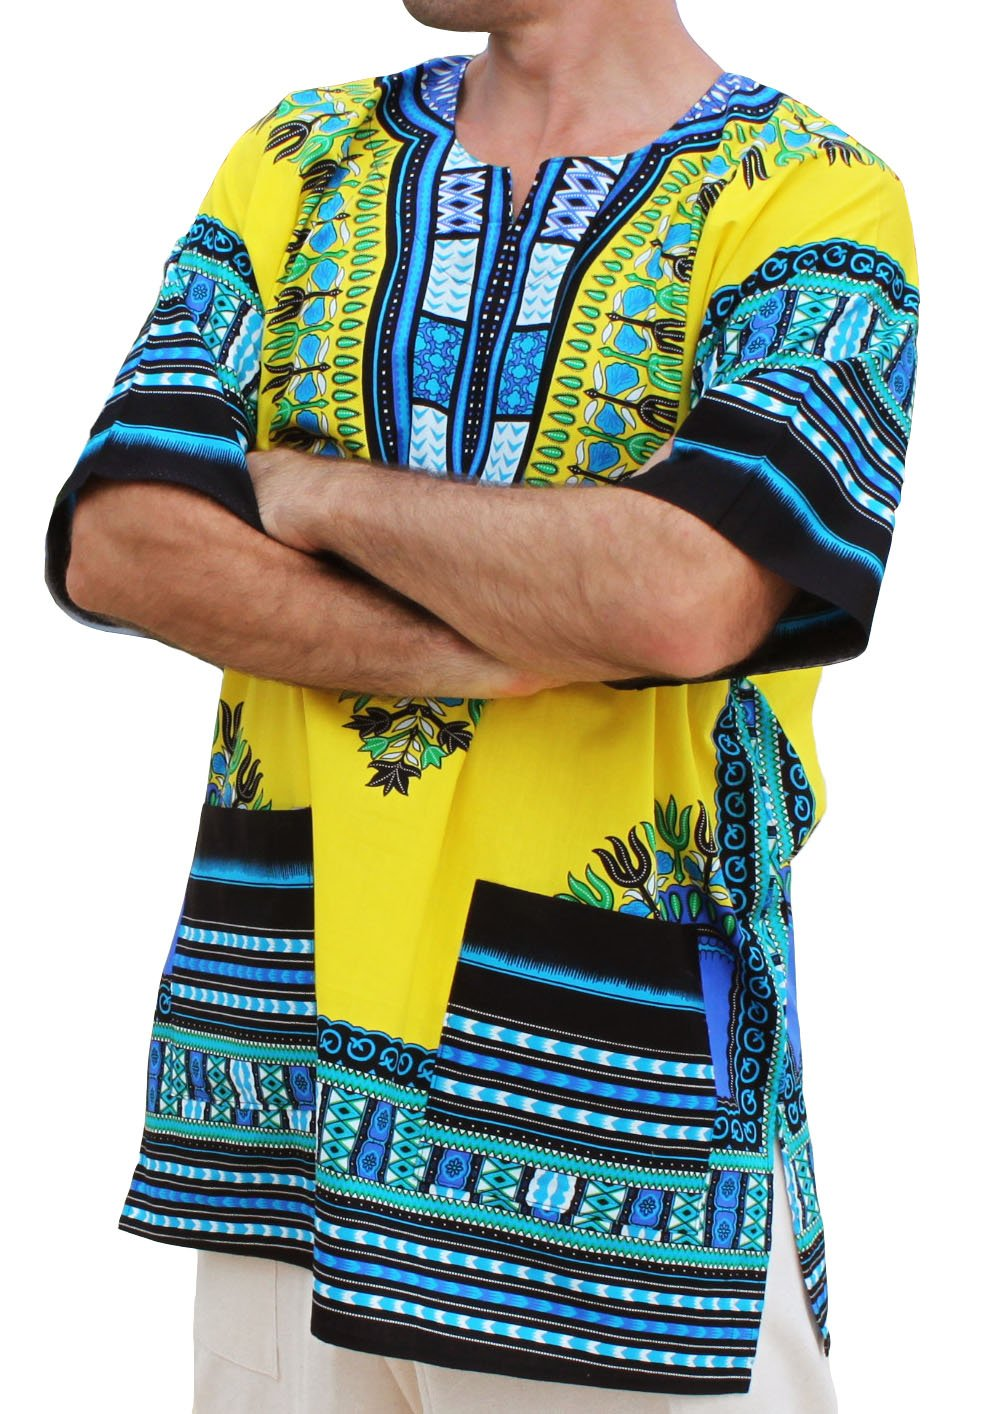 Raan Pah Muang RaanPahMuang Unisex African Bright Dashiki Cotton Shirt Variety Colors variant15060AMZ